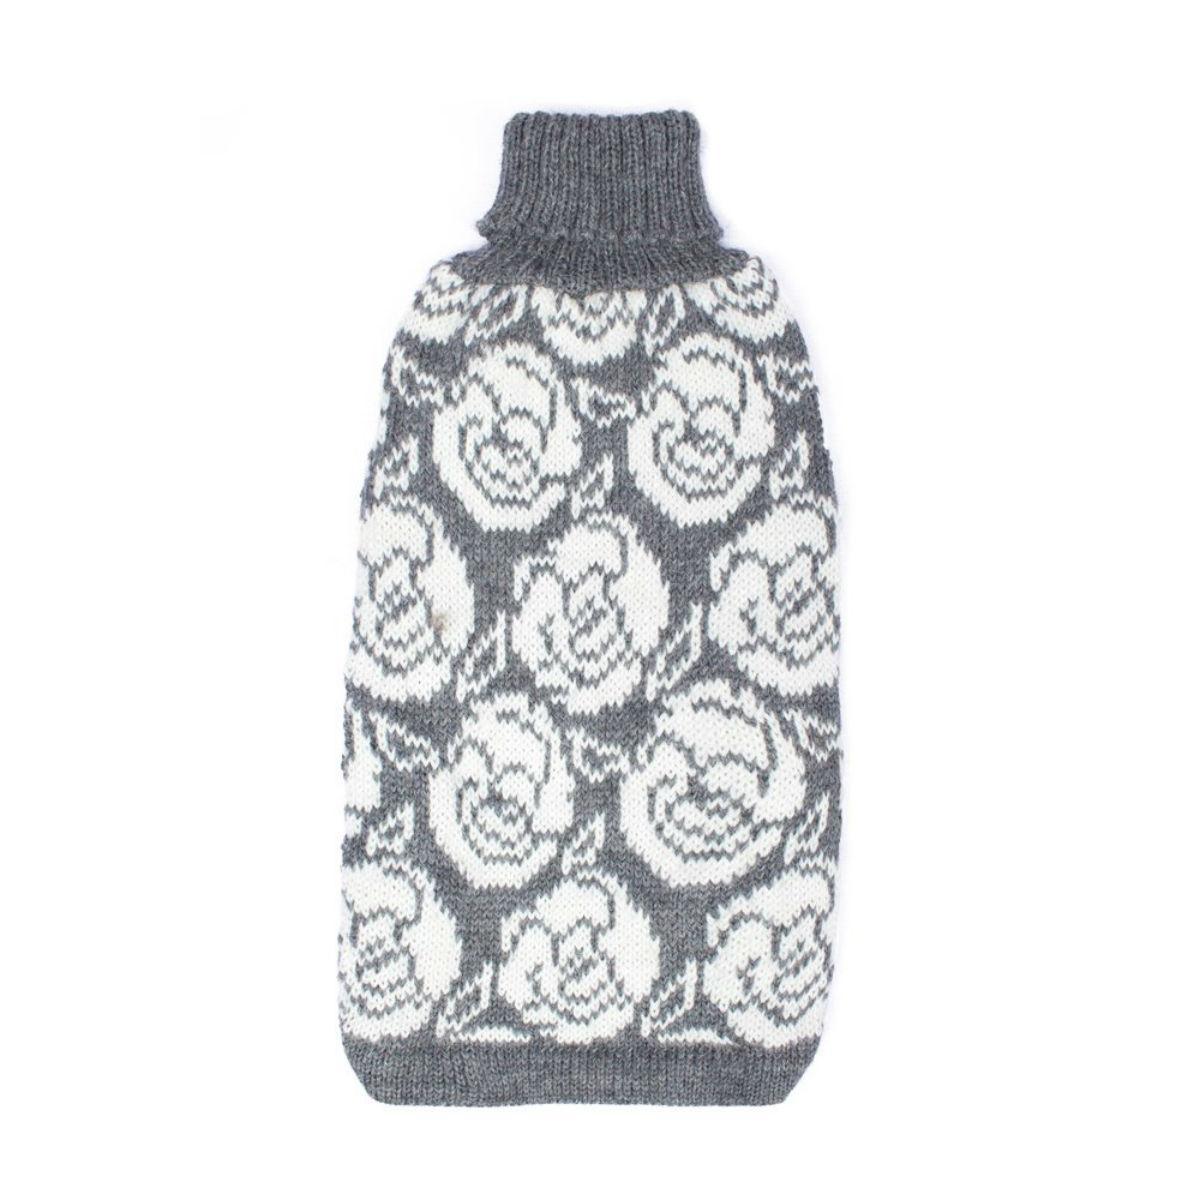 I Love Roses Alpaca Dog Sweater by Alqo Wasi